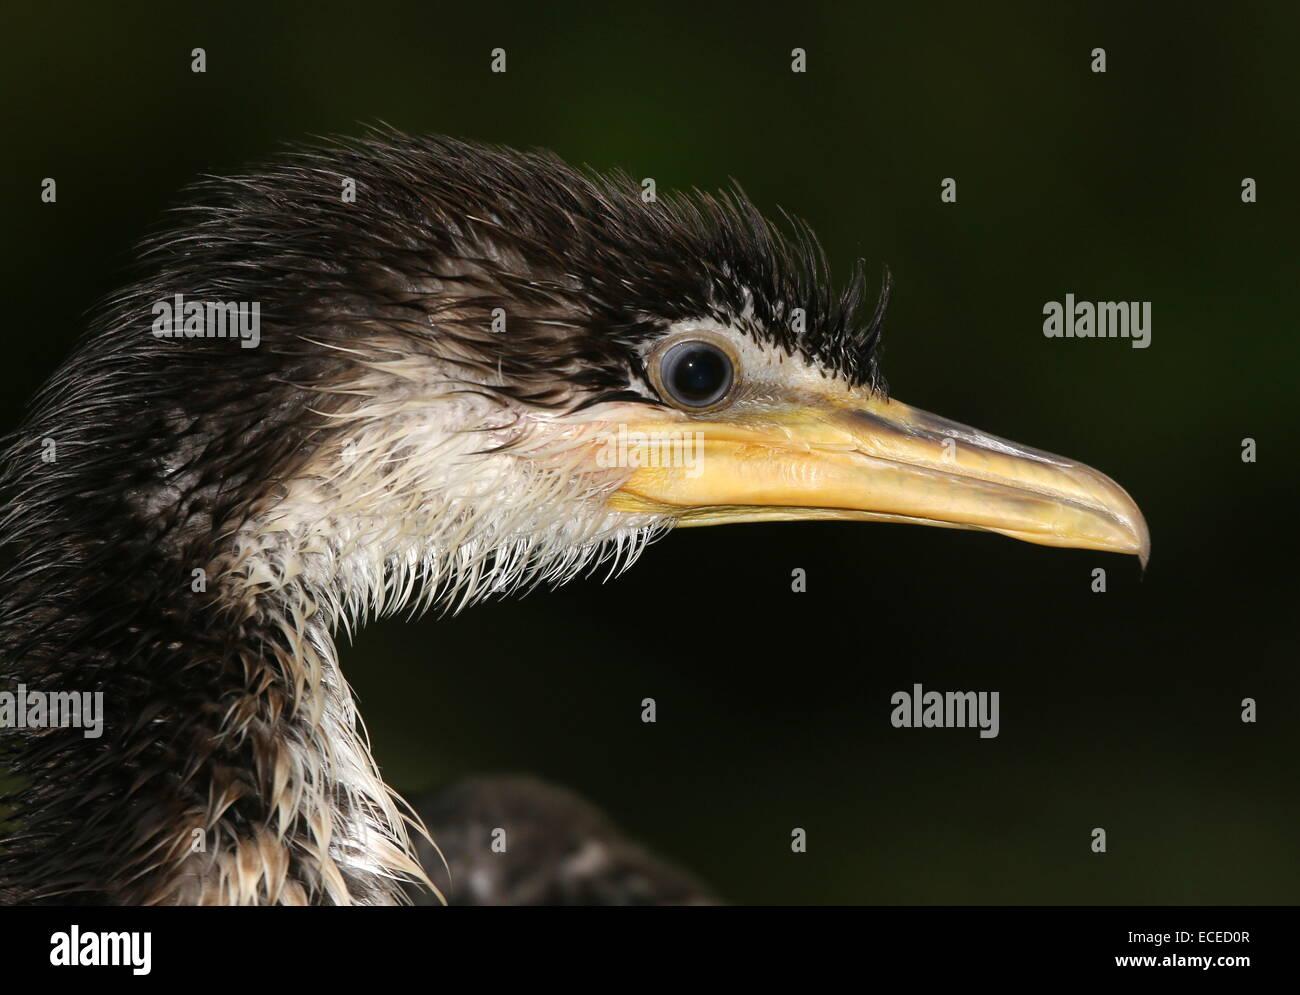 Juvenile Australian Little pied cormorant (Phalacrocorax melanoleucos, Microcarbo melanoleucos) close-up of the - Stock Image